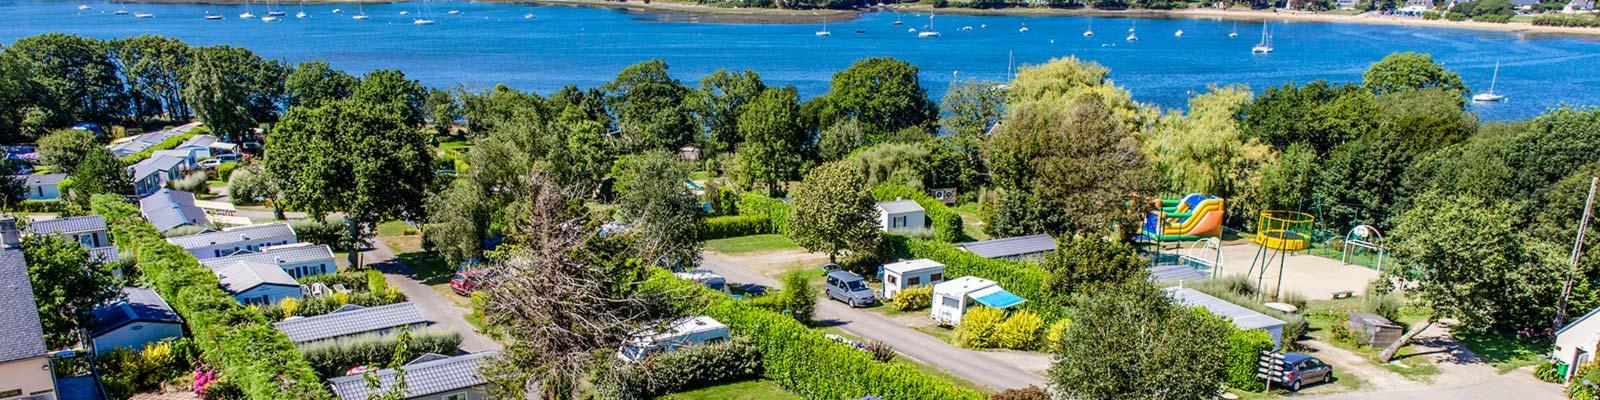 Camping Kerlouan Location Mobil Home Kerlouan Bretagne Nord